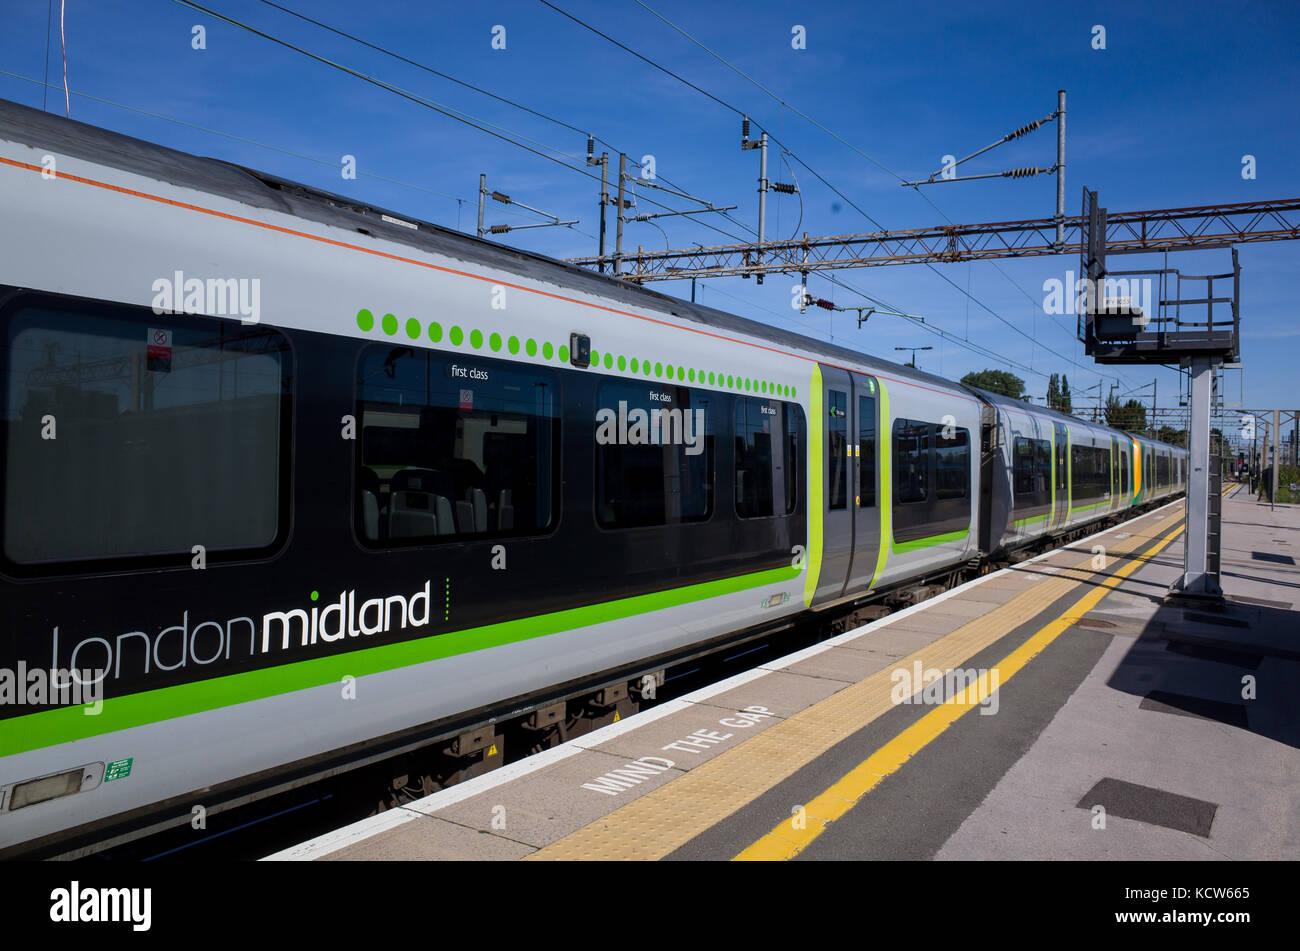 A London Midland train waits at the platform of Northampton Railway Station. Stock Photo